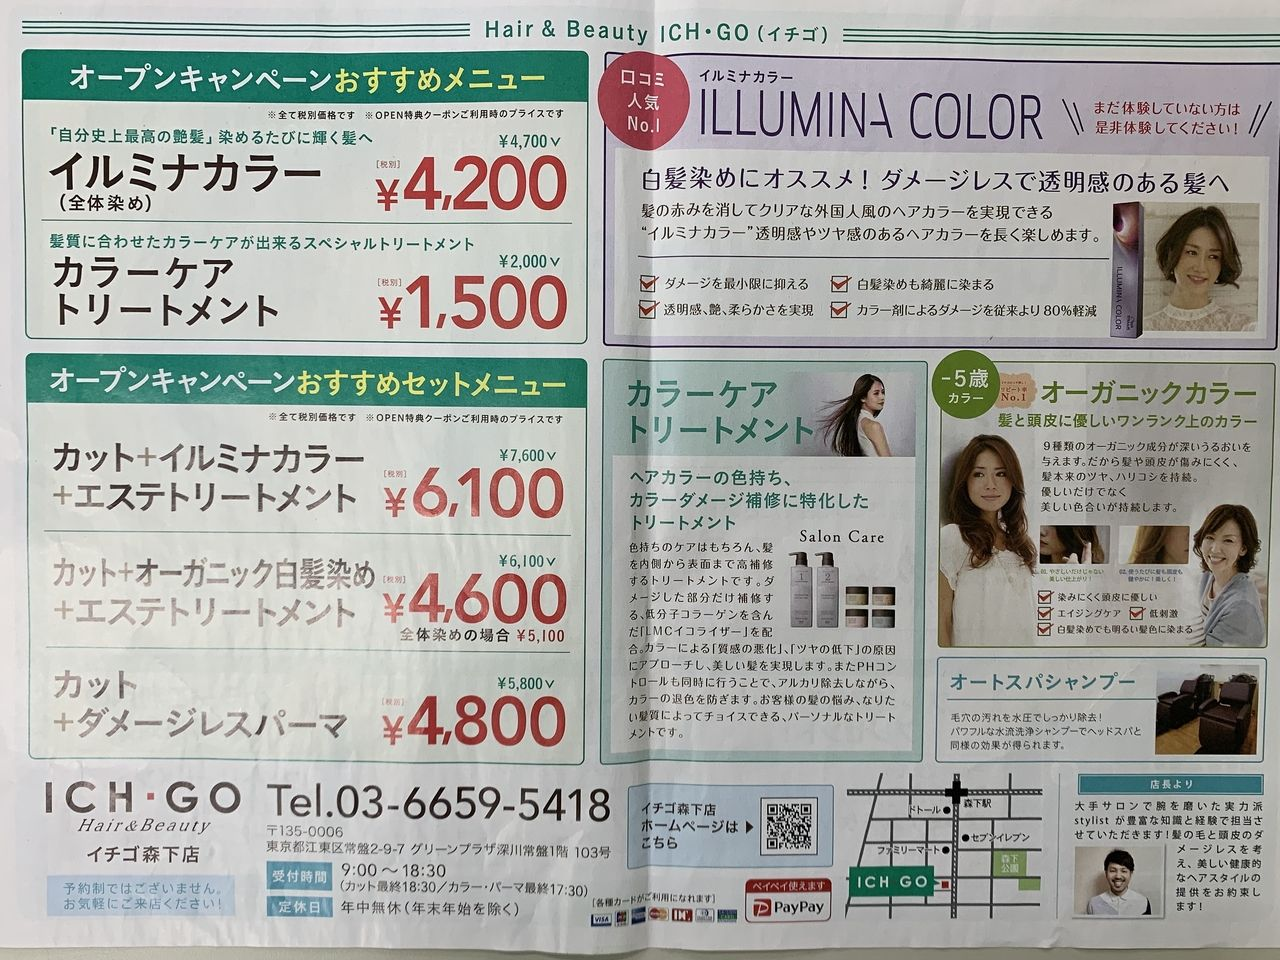 ICH・GO 森下店 美容室 キャンペーン サービス  写真